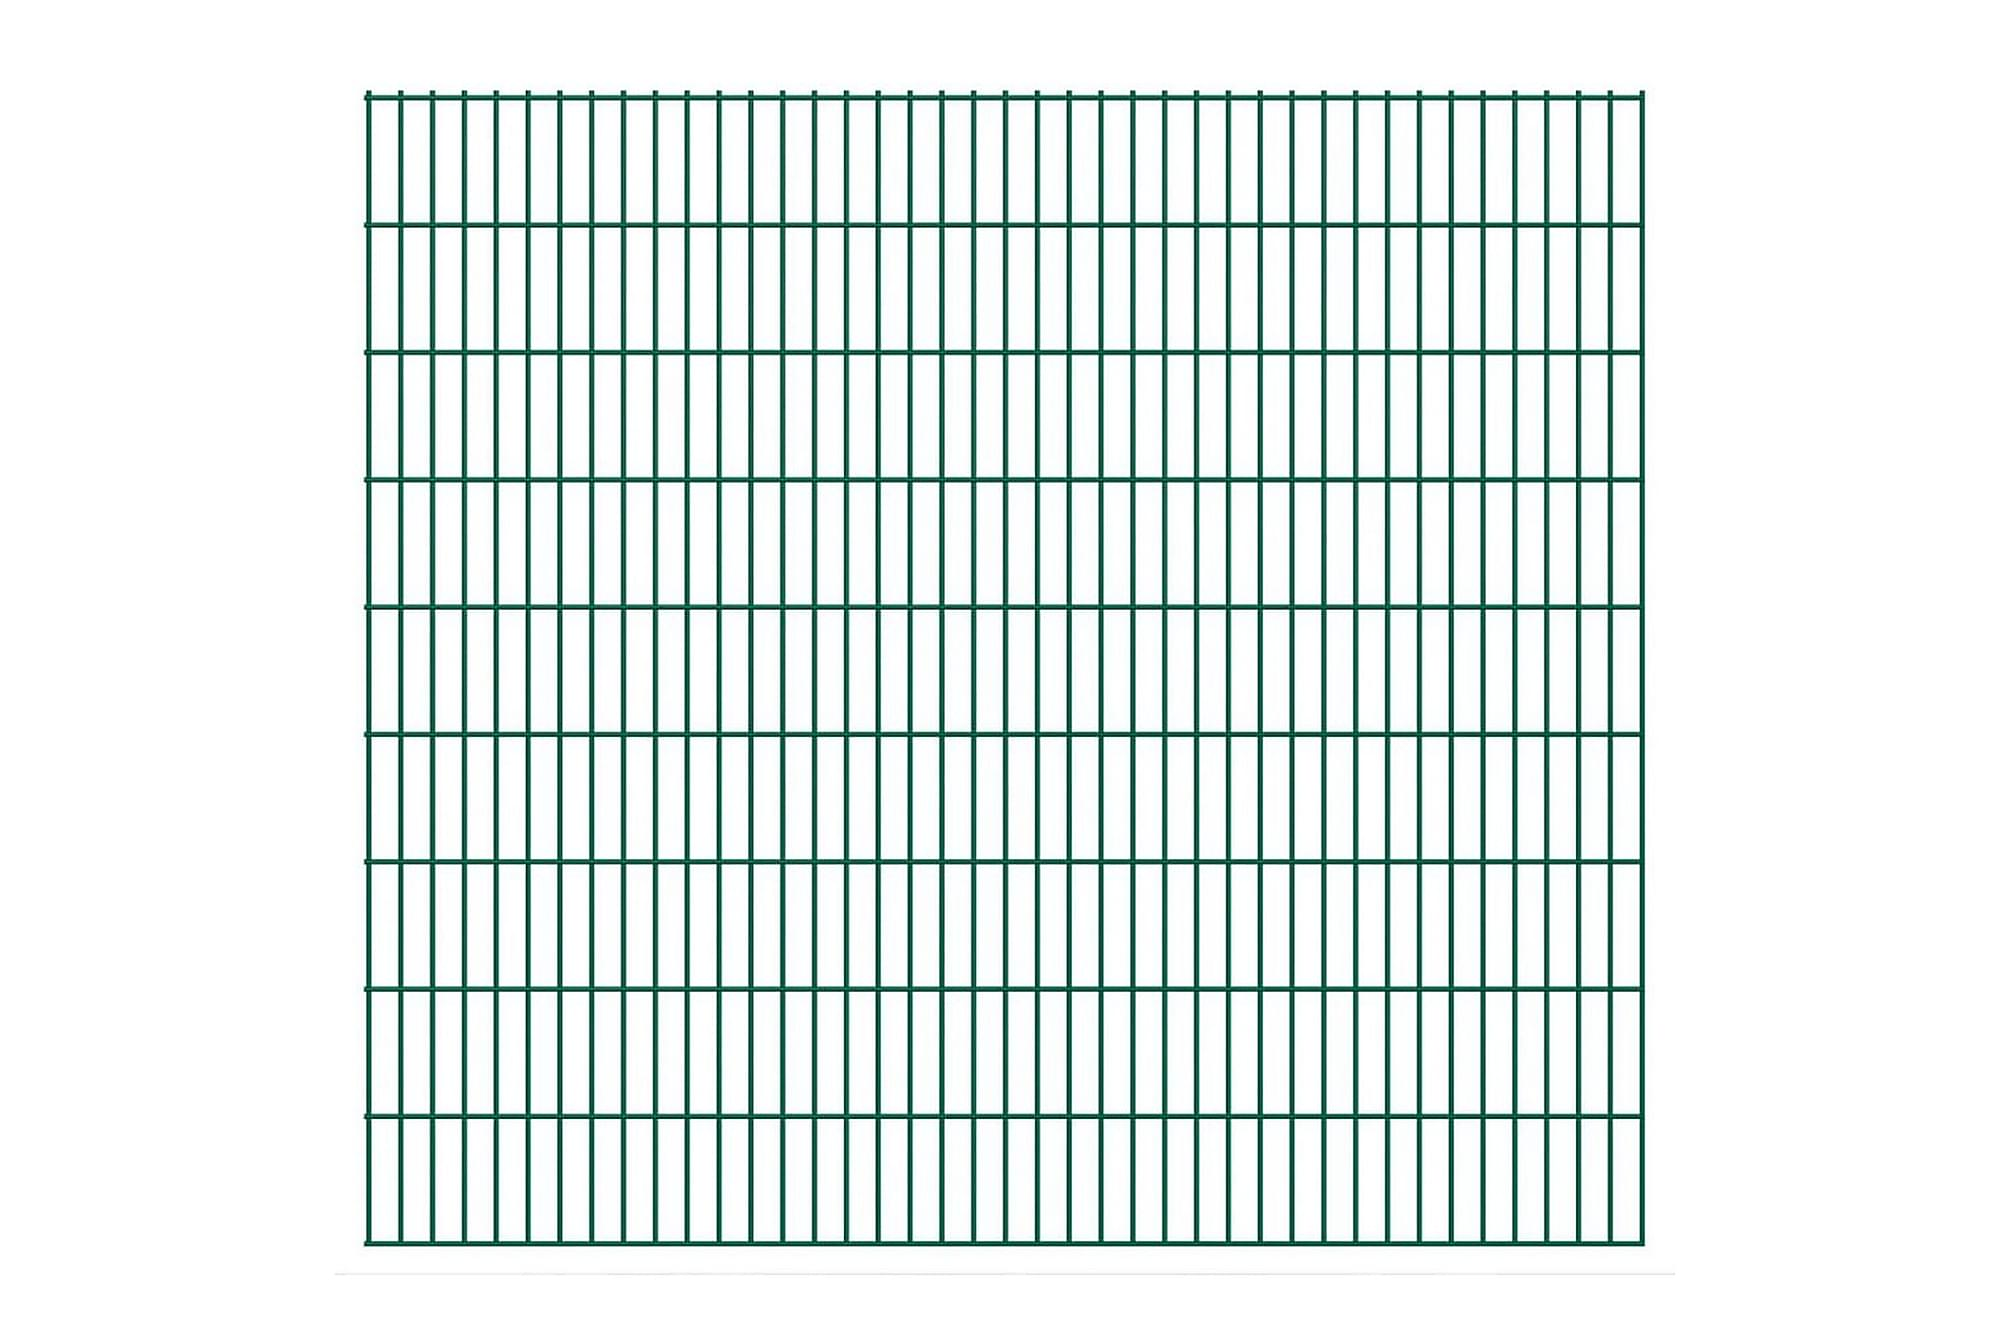 2D Stängselpaneler 2,008x1,83 m grön, Staket & grindar